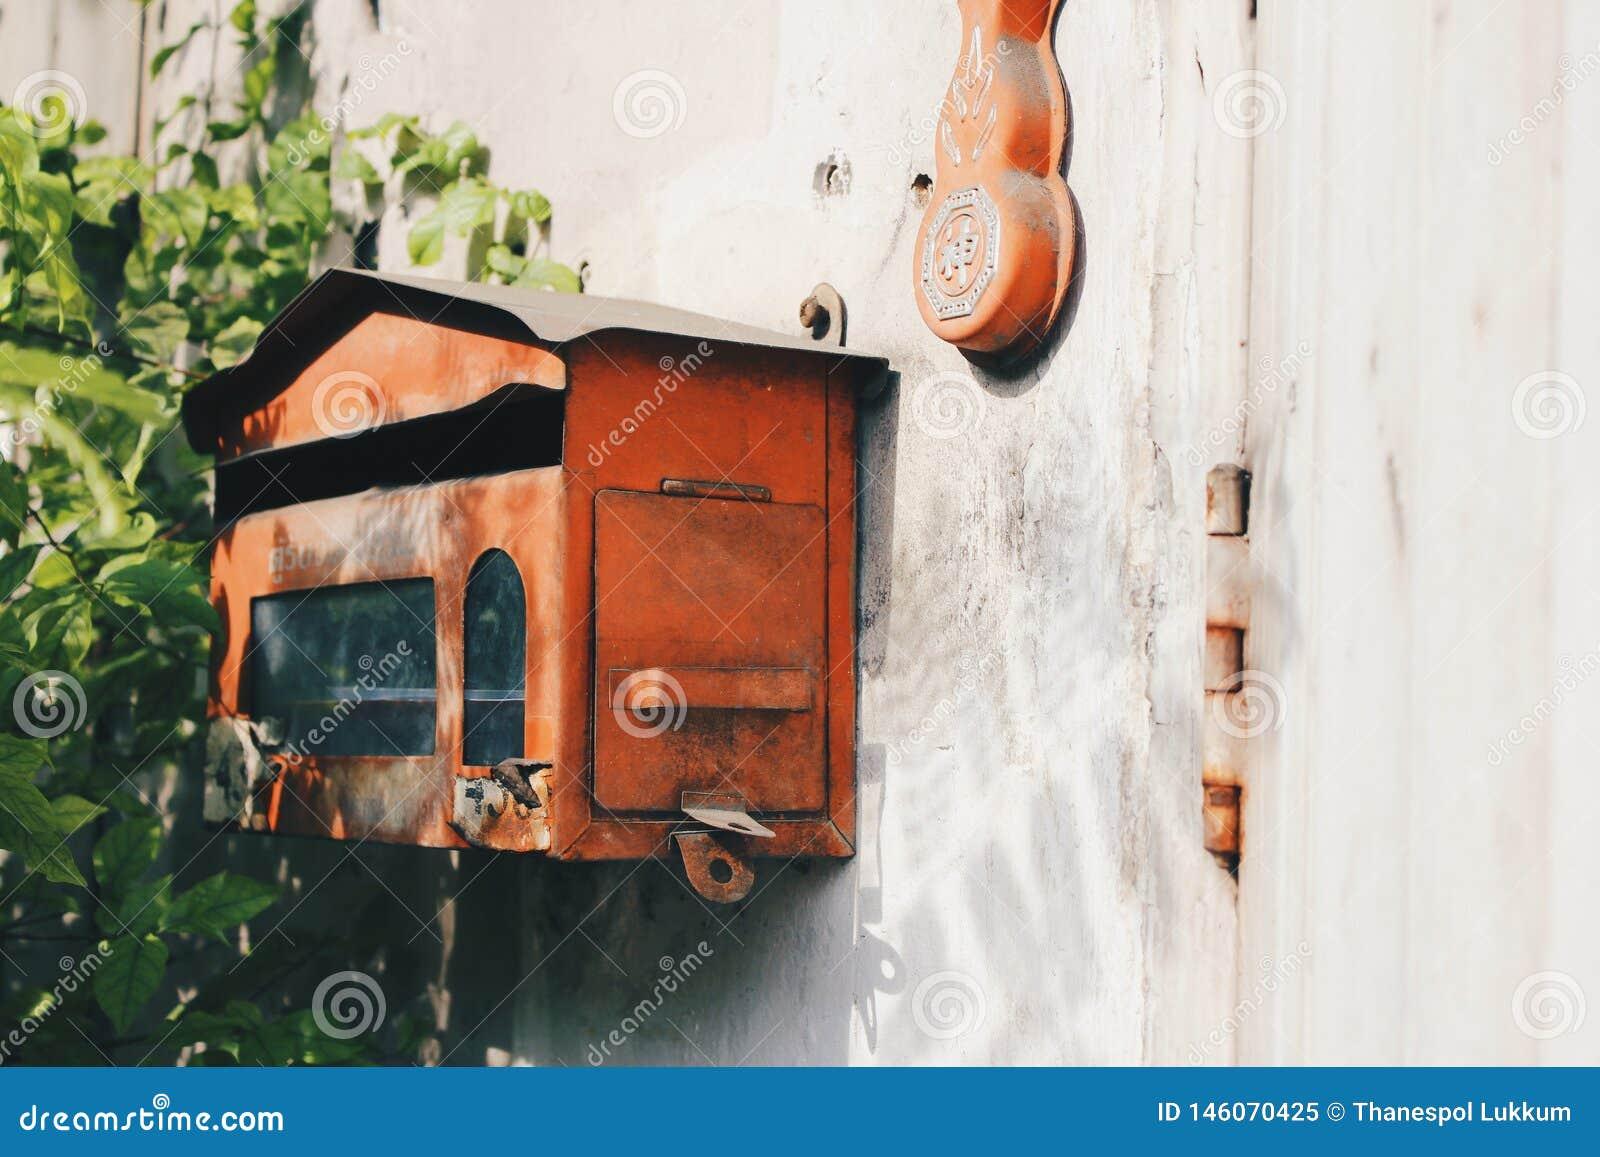 Красная коробка столба на грязной стене